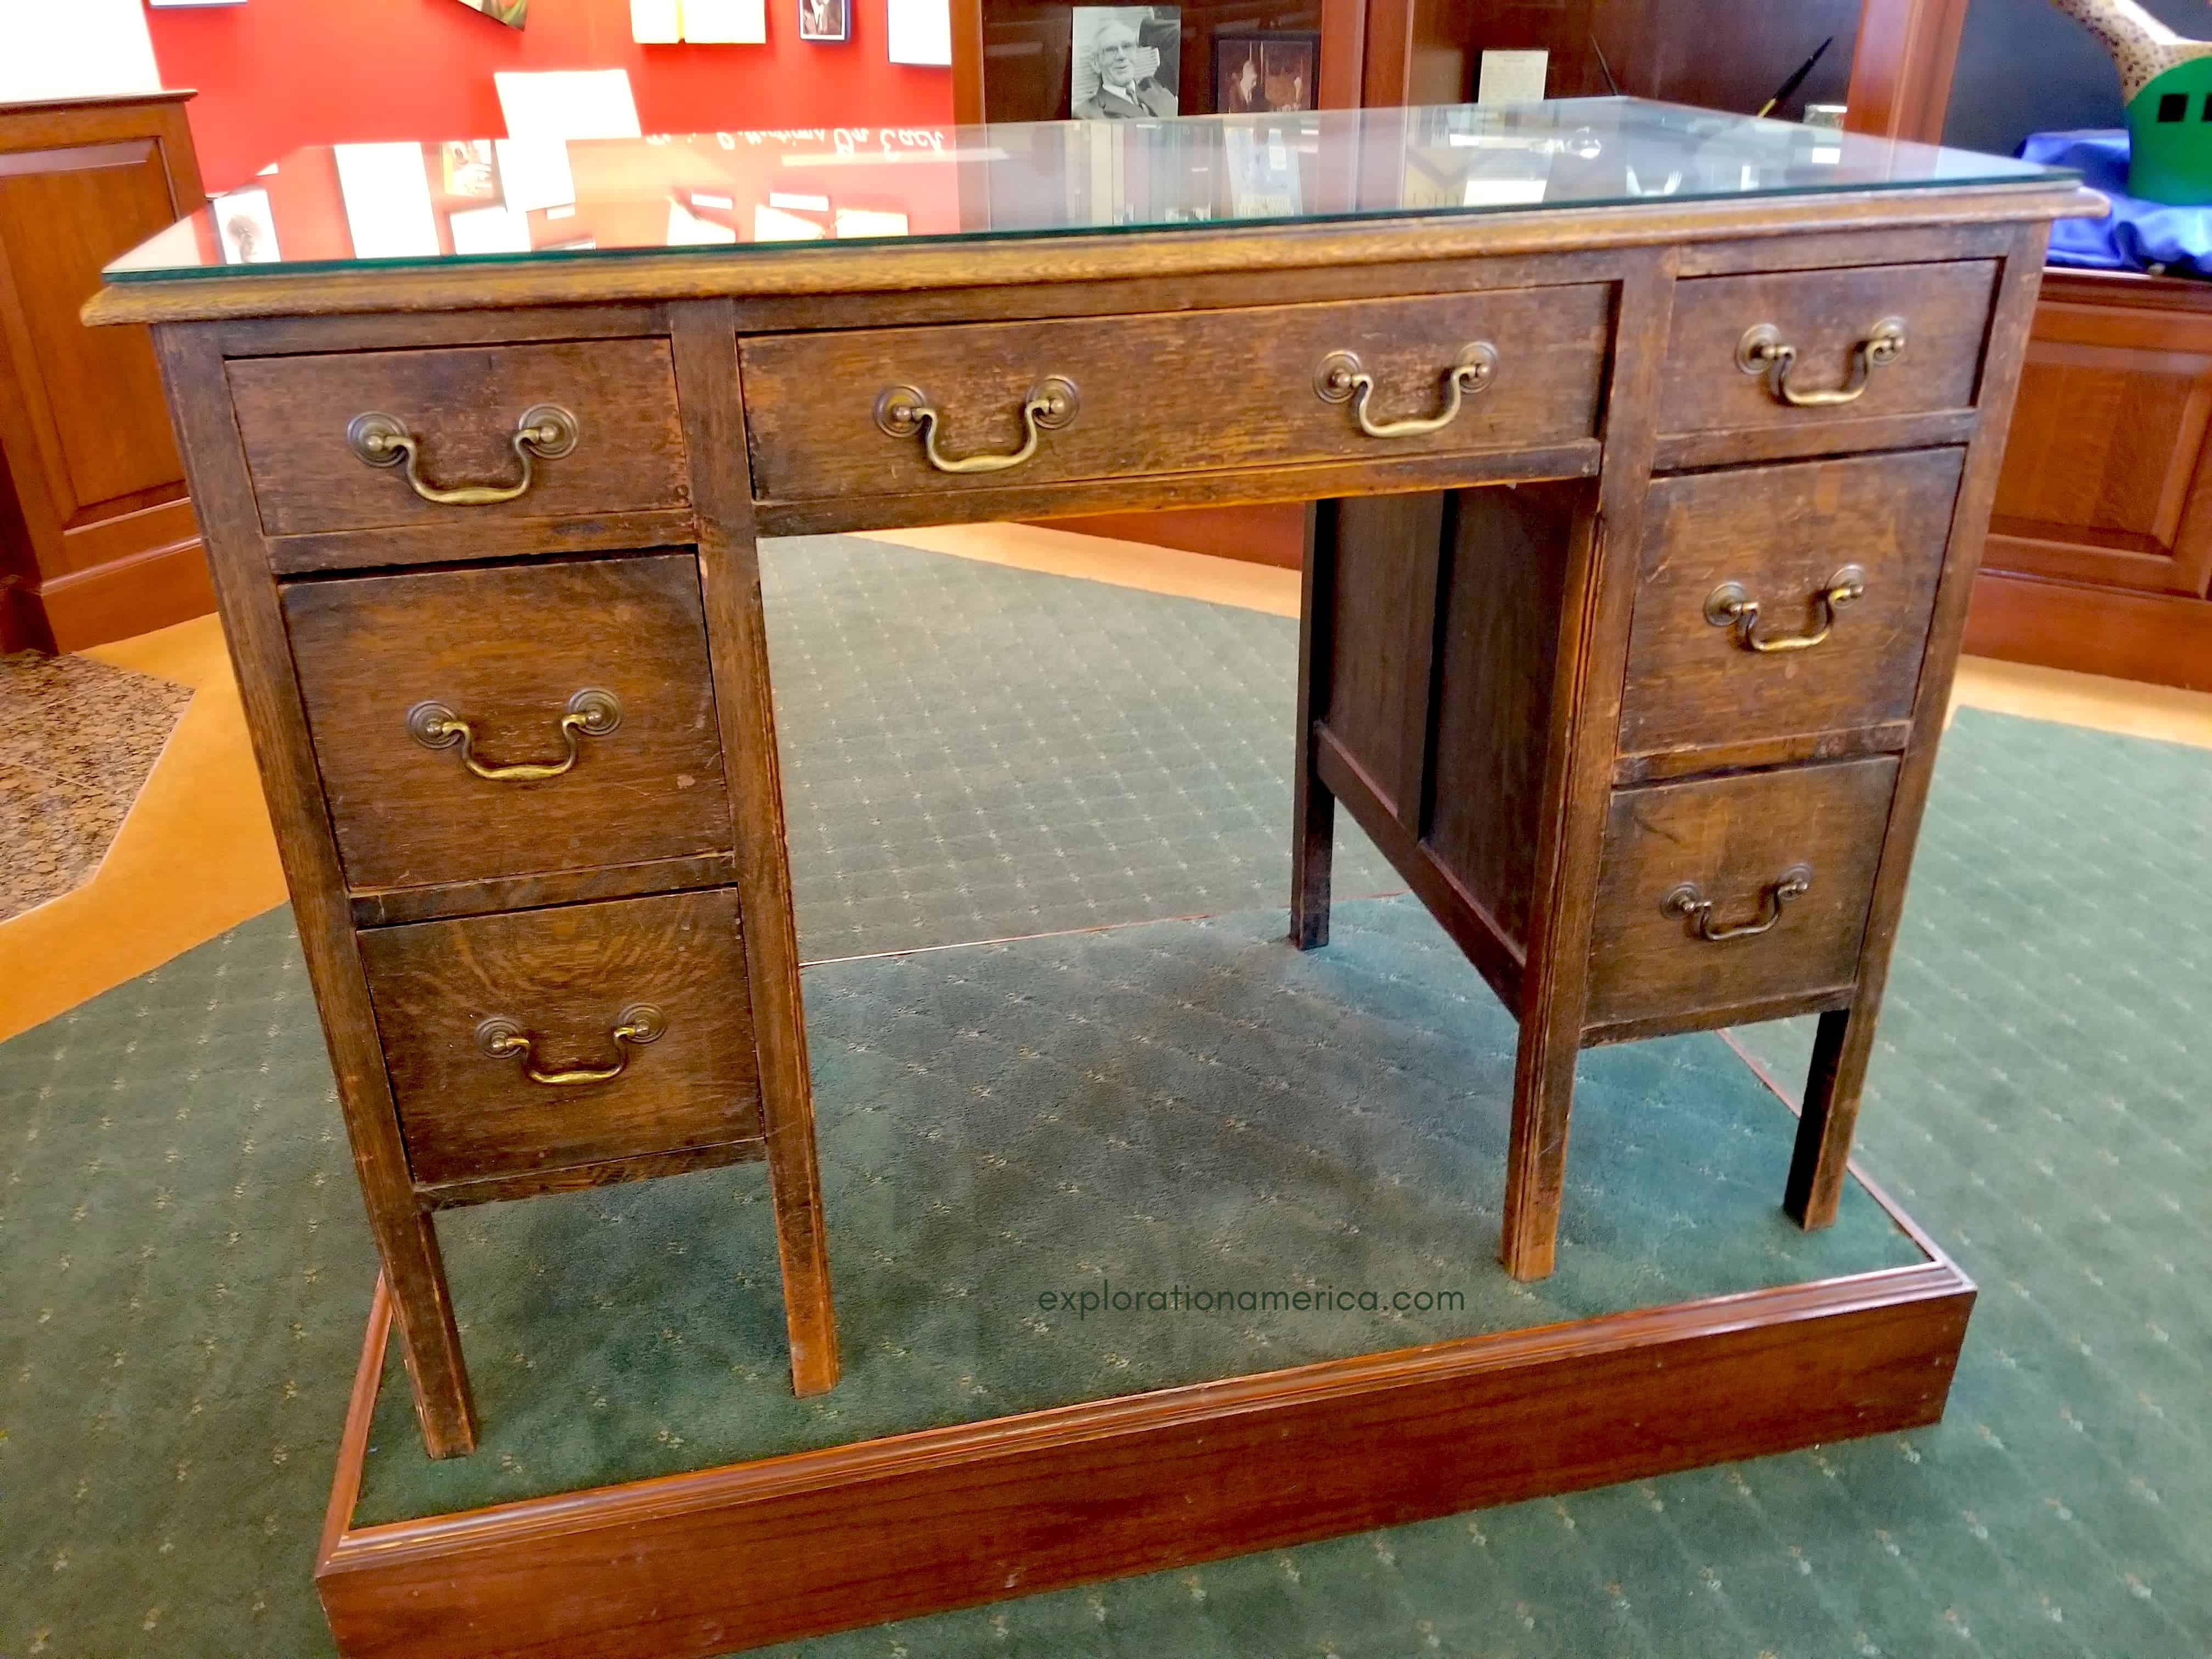 JRR Tolkien desk